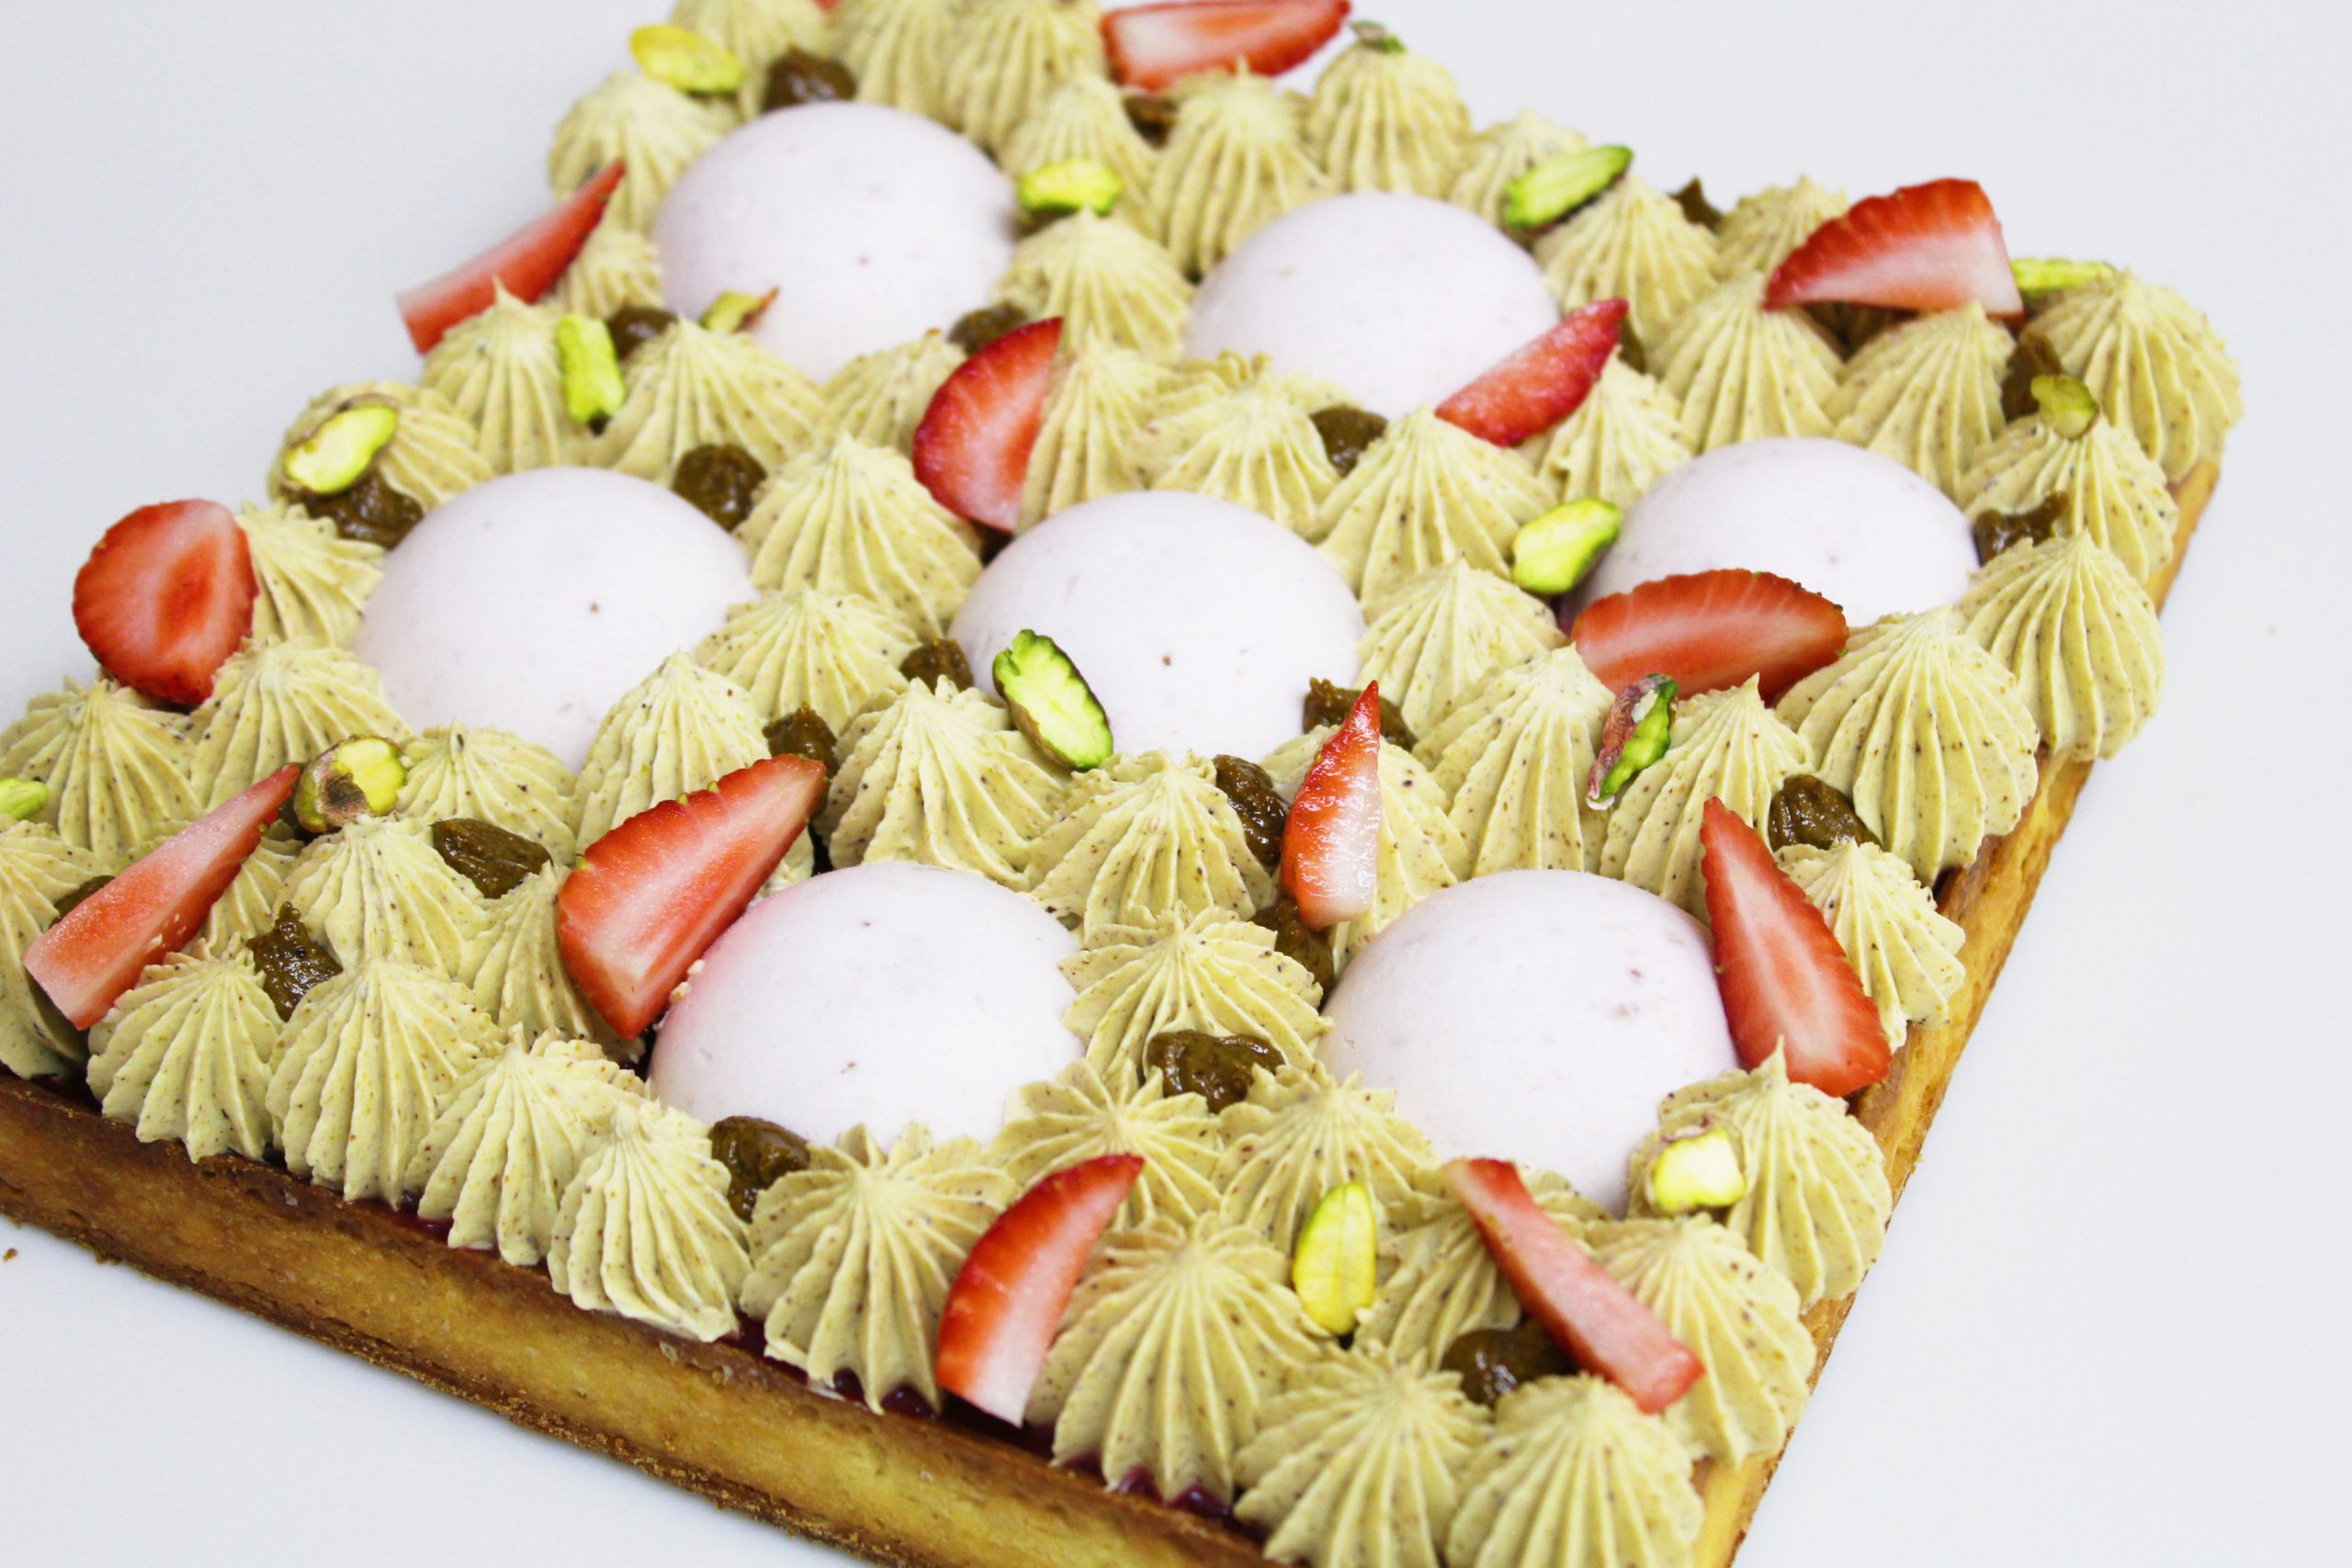 Strawberry and Pistachio Pie